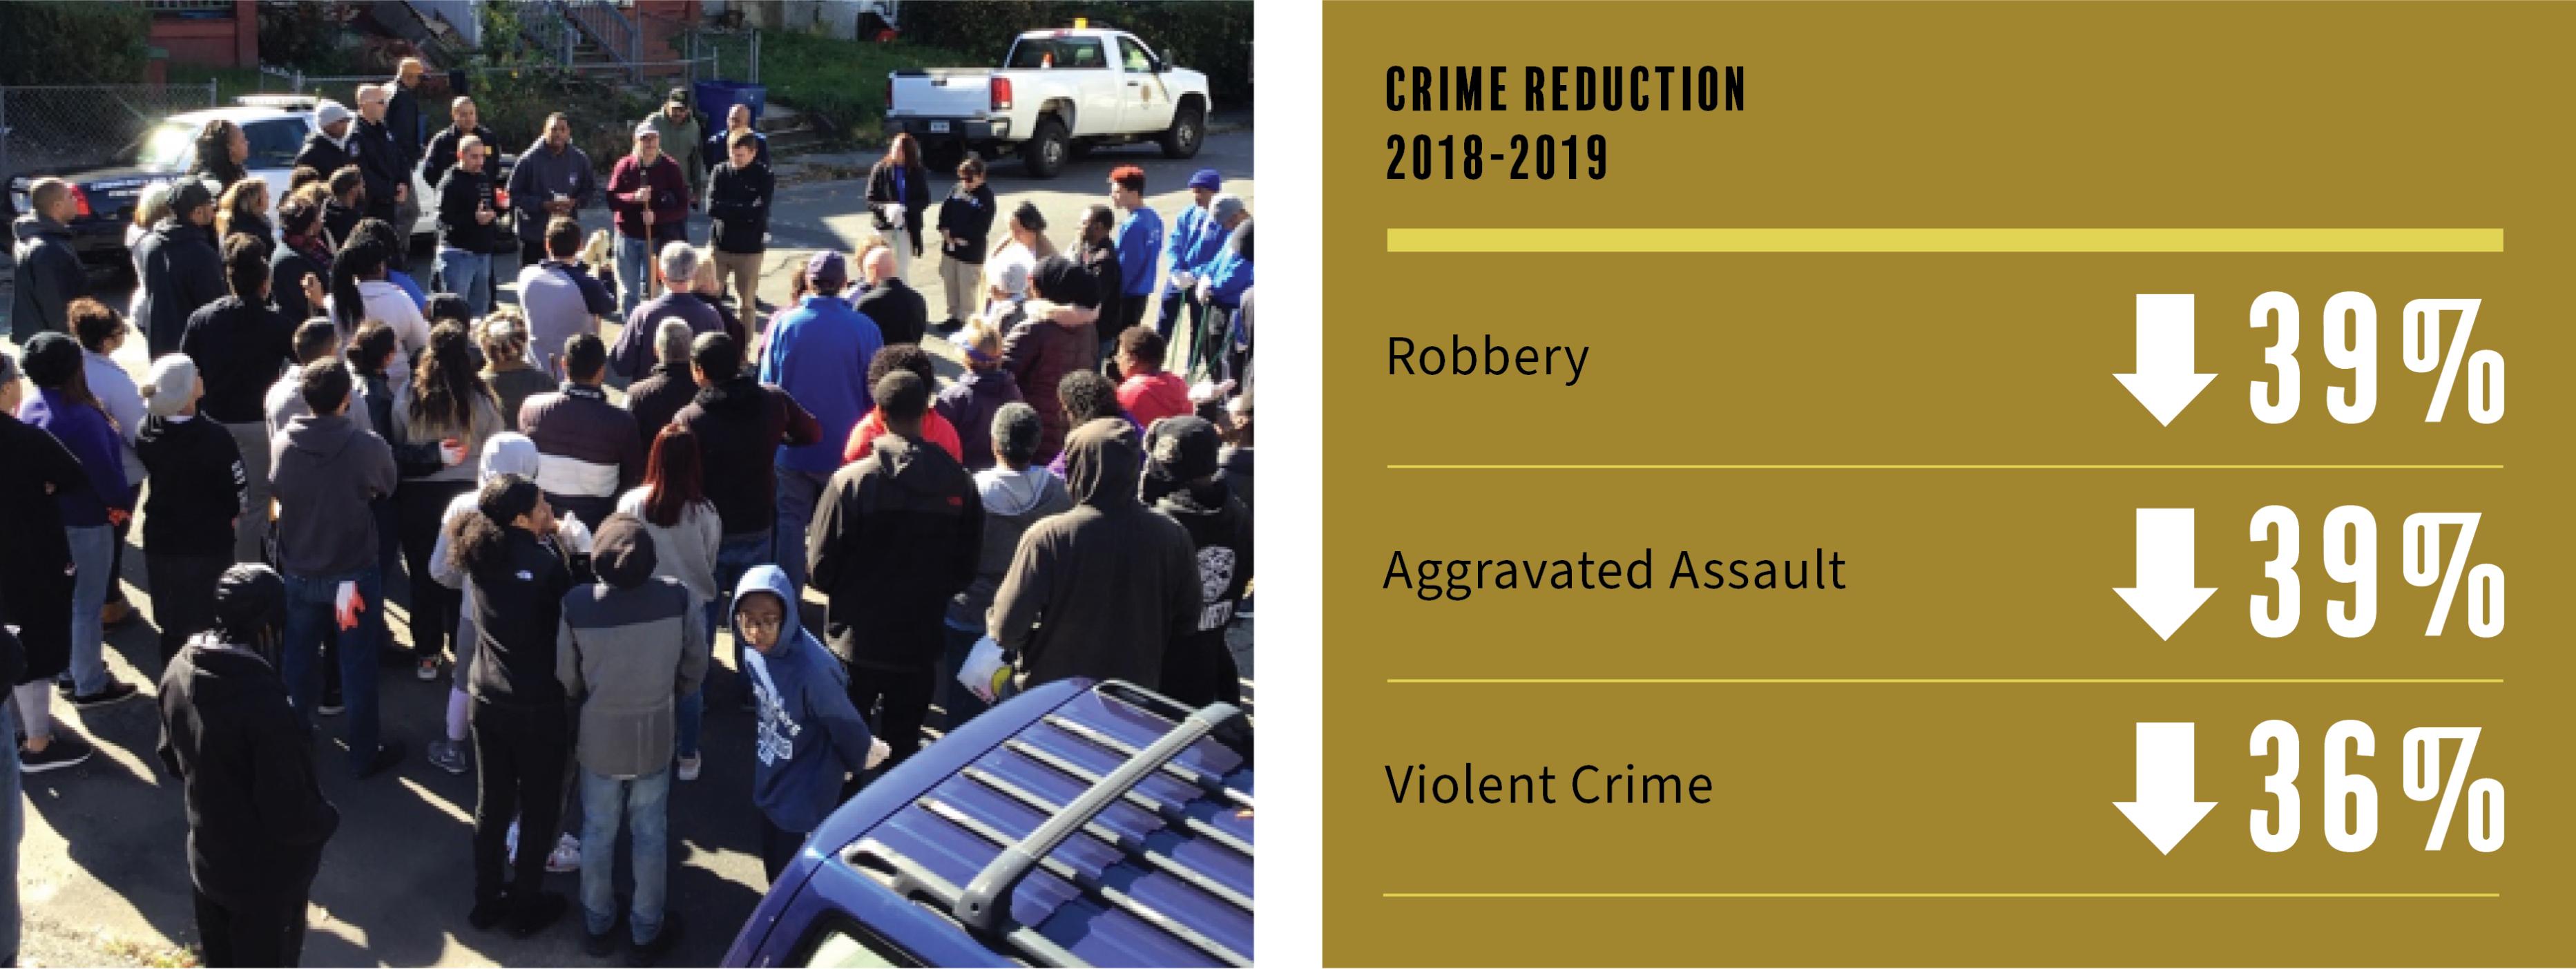 waterbury_website_infographic_crime.jpg